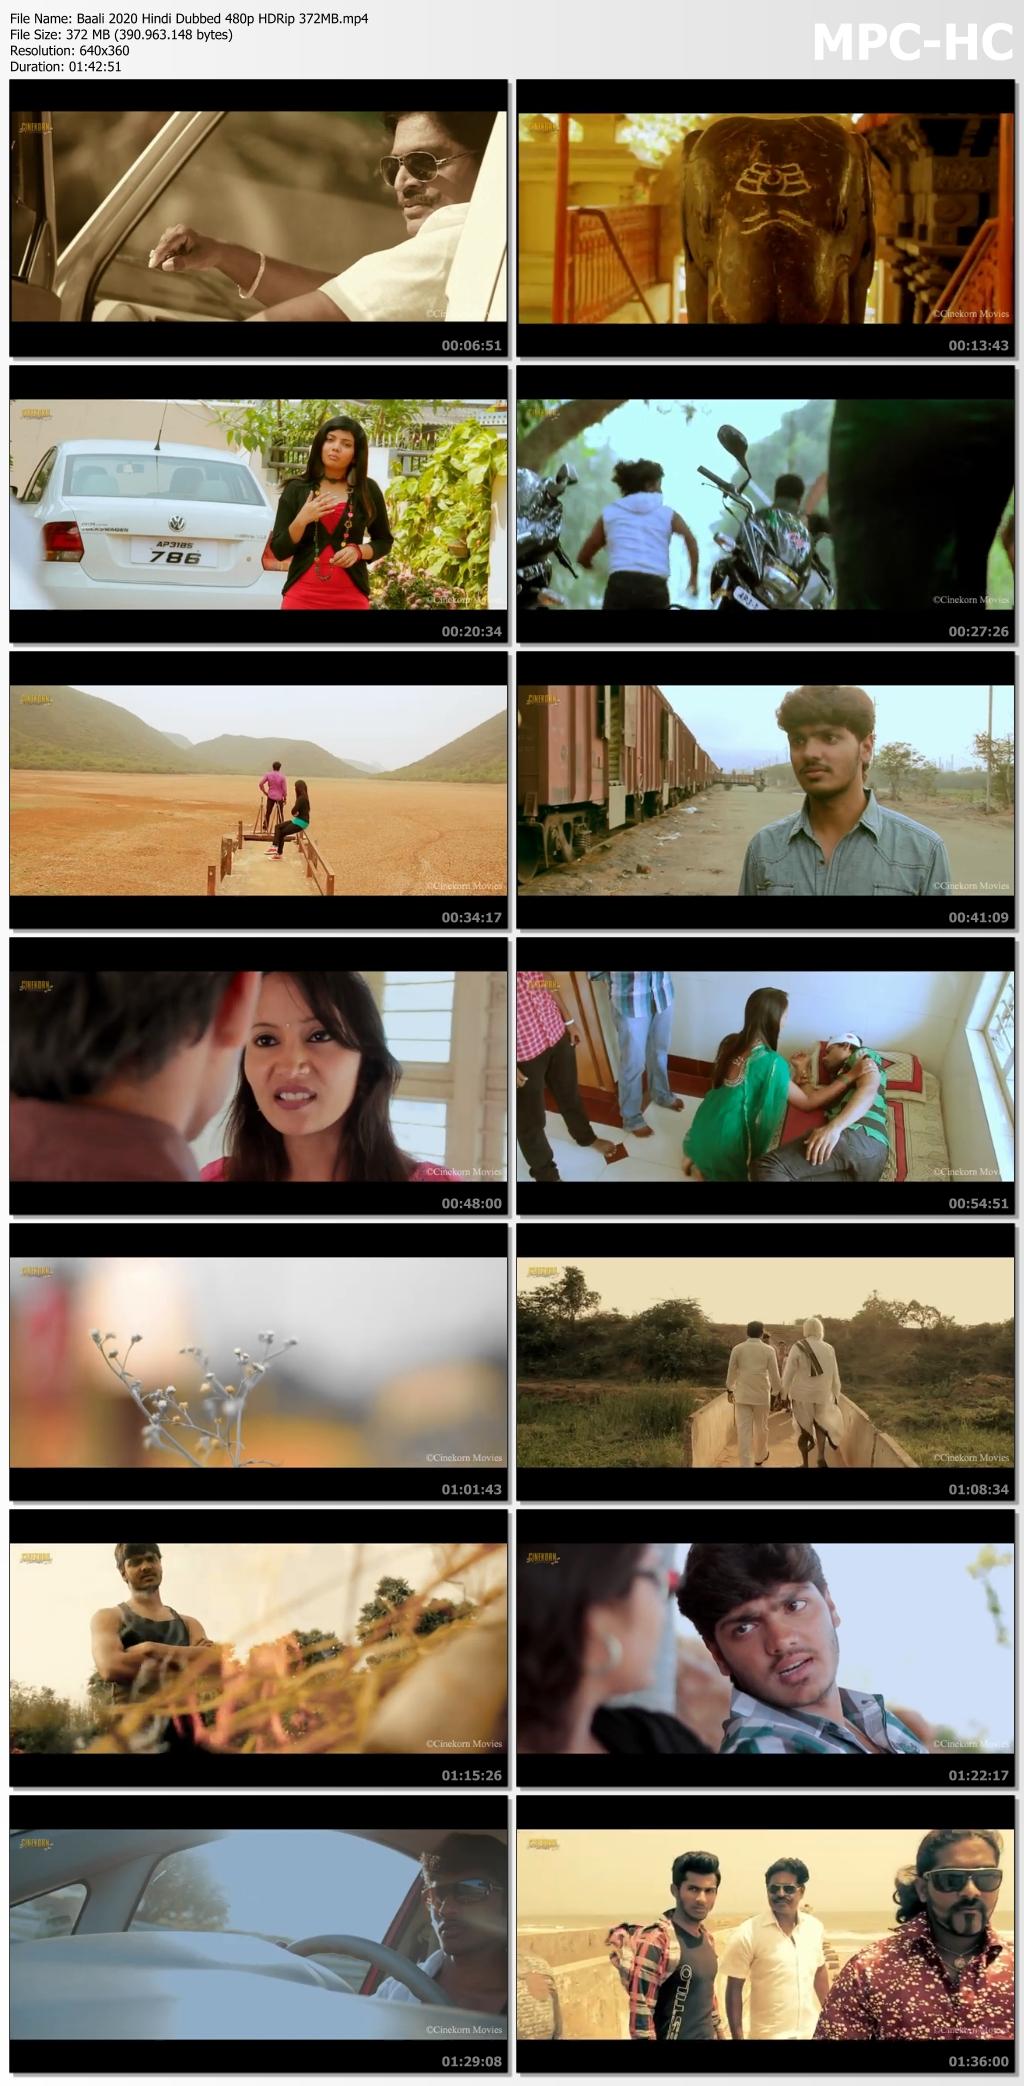 Baali-2020-Hindi-Dubbed-480p-HDRip-372-MB-mp4-thumbs